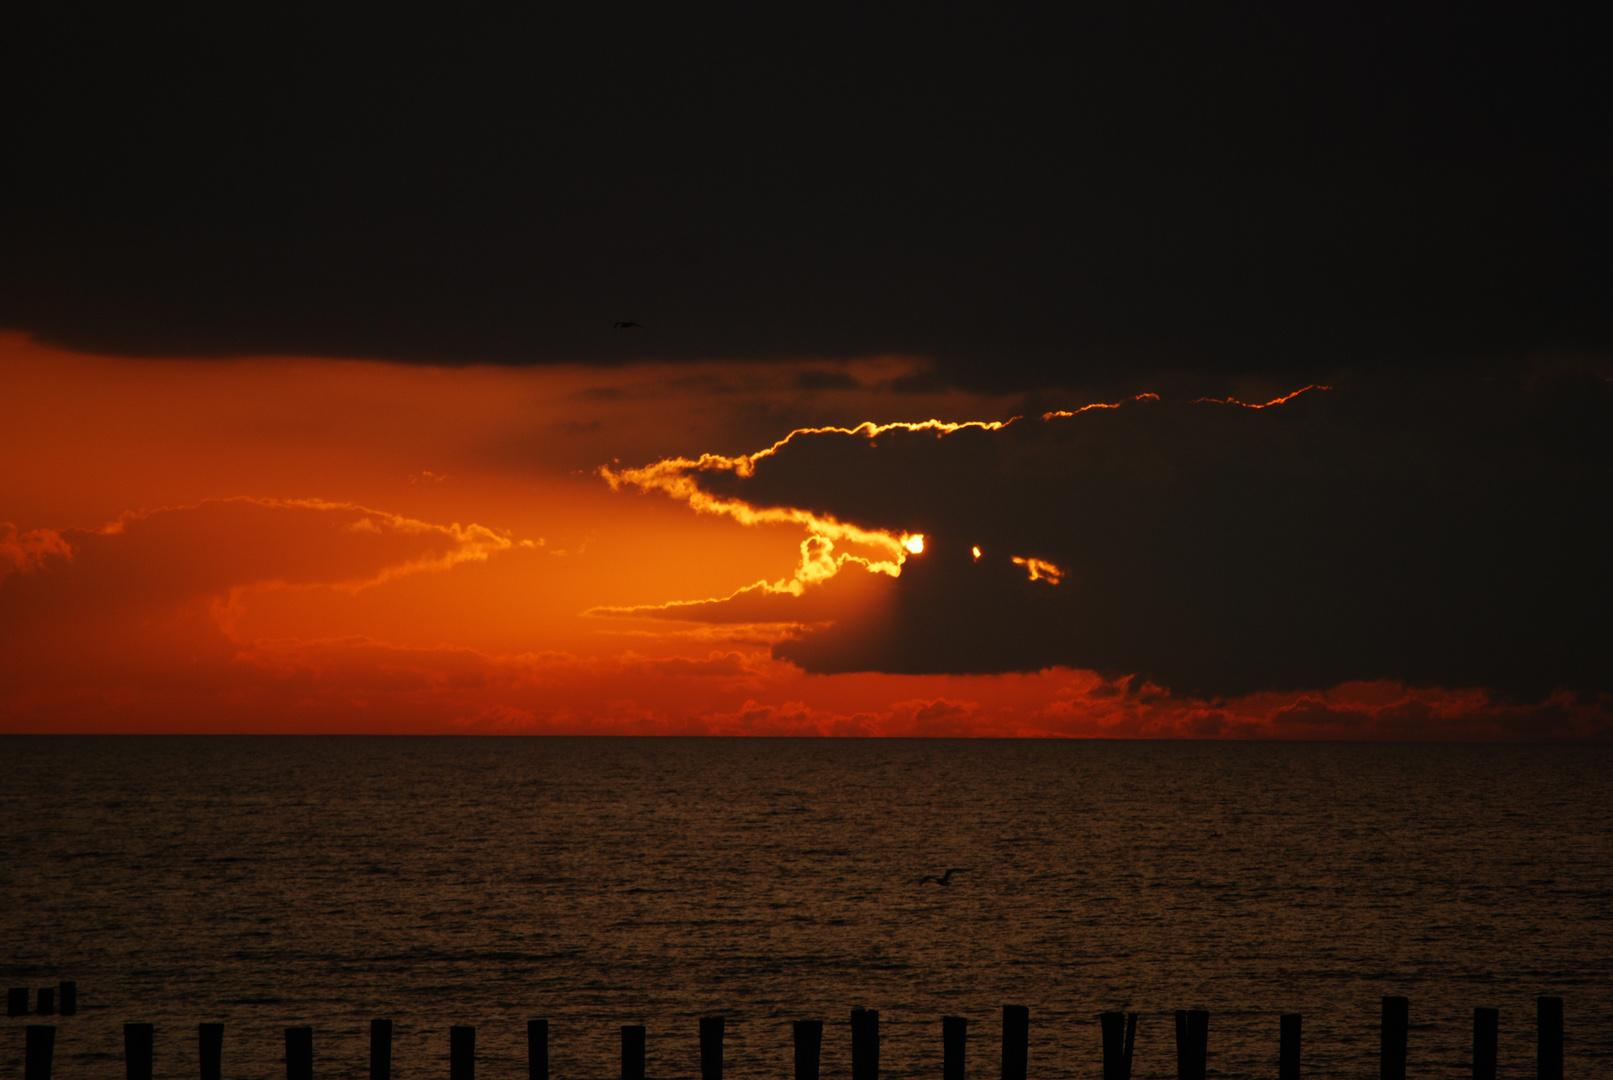 Gefräßige Wolke